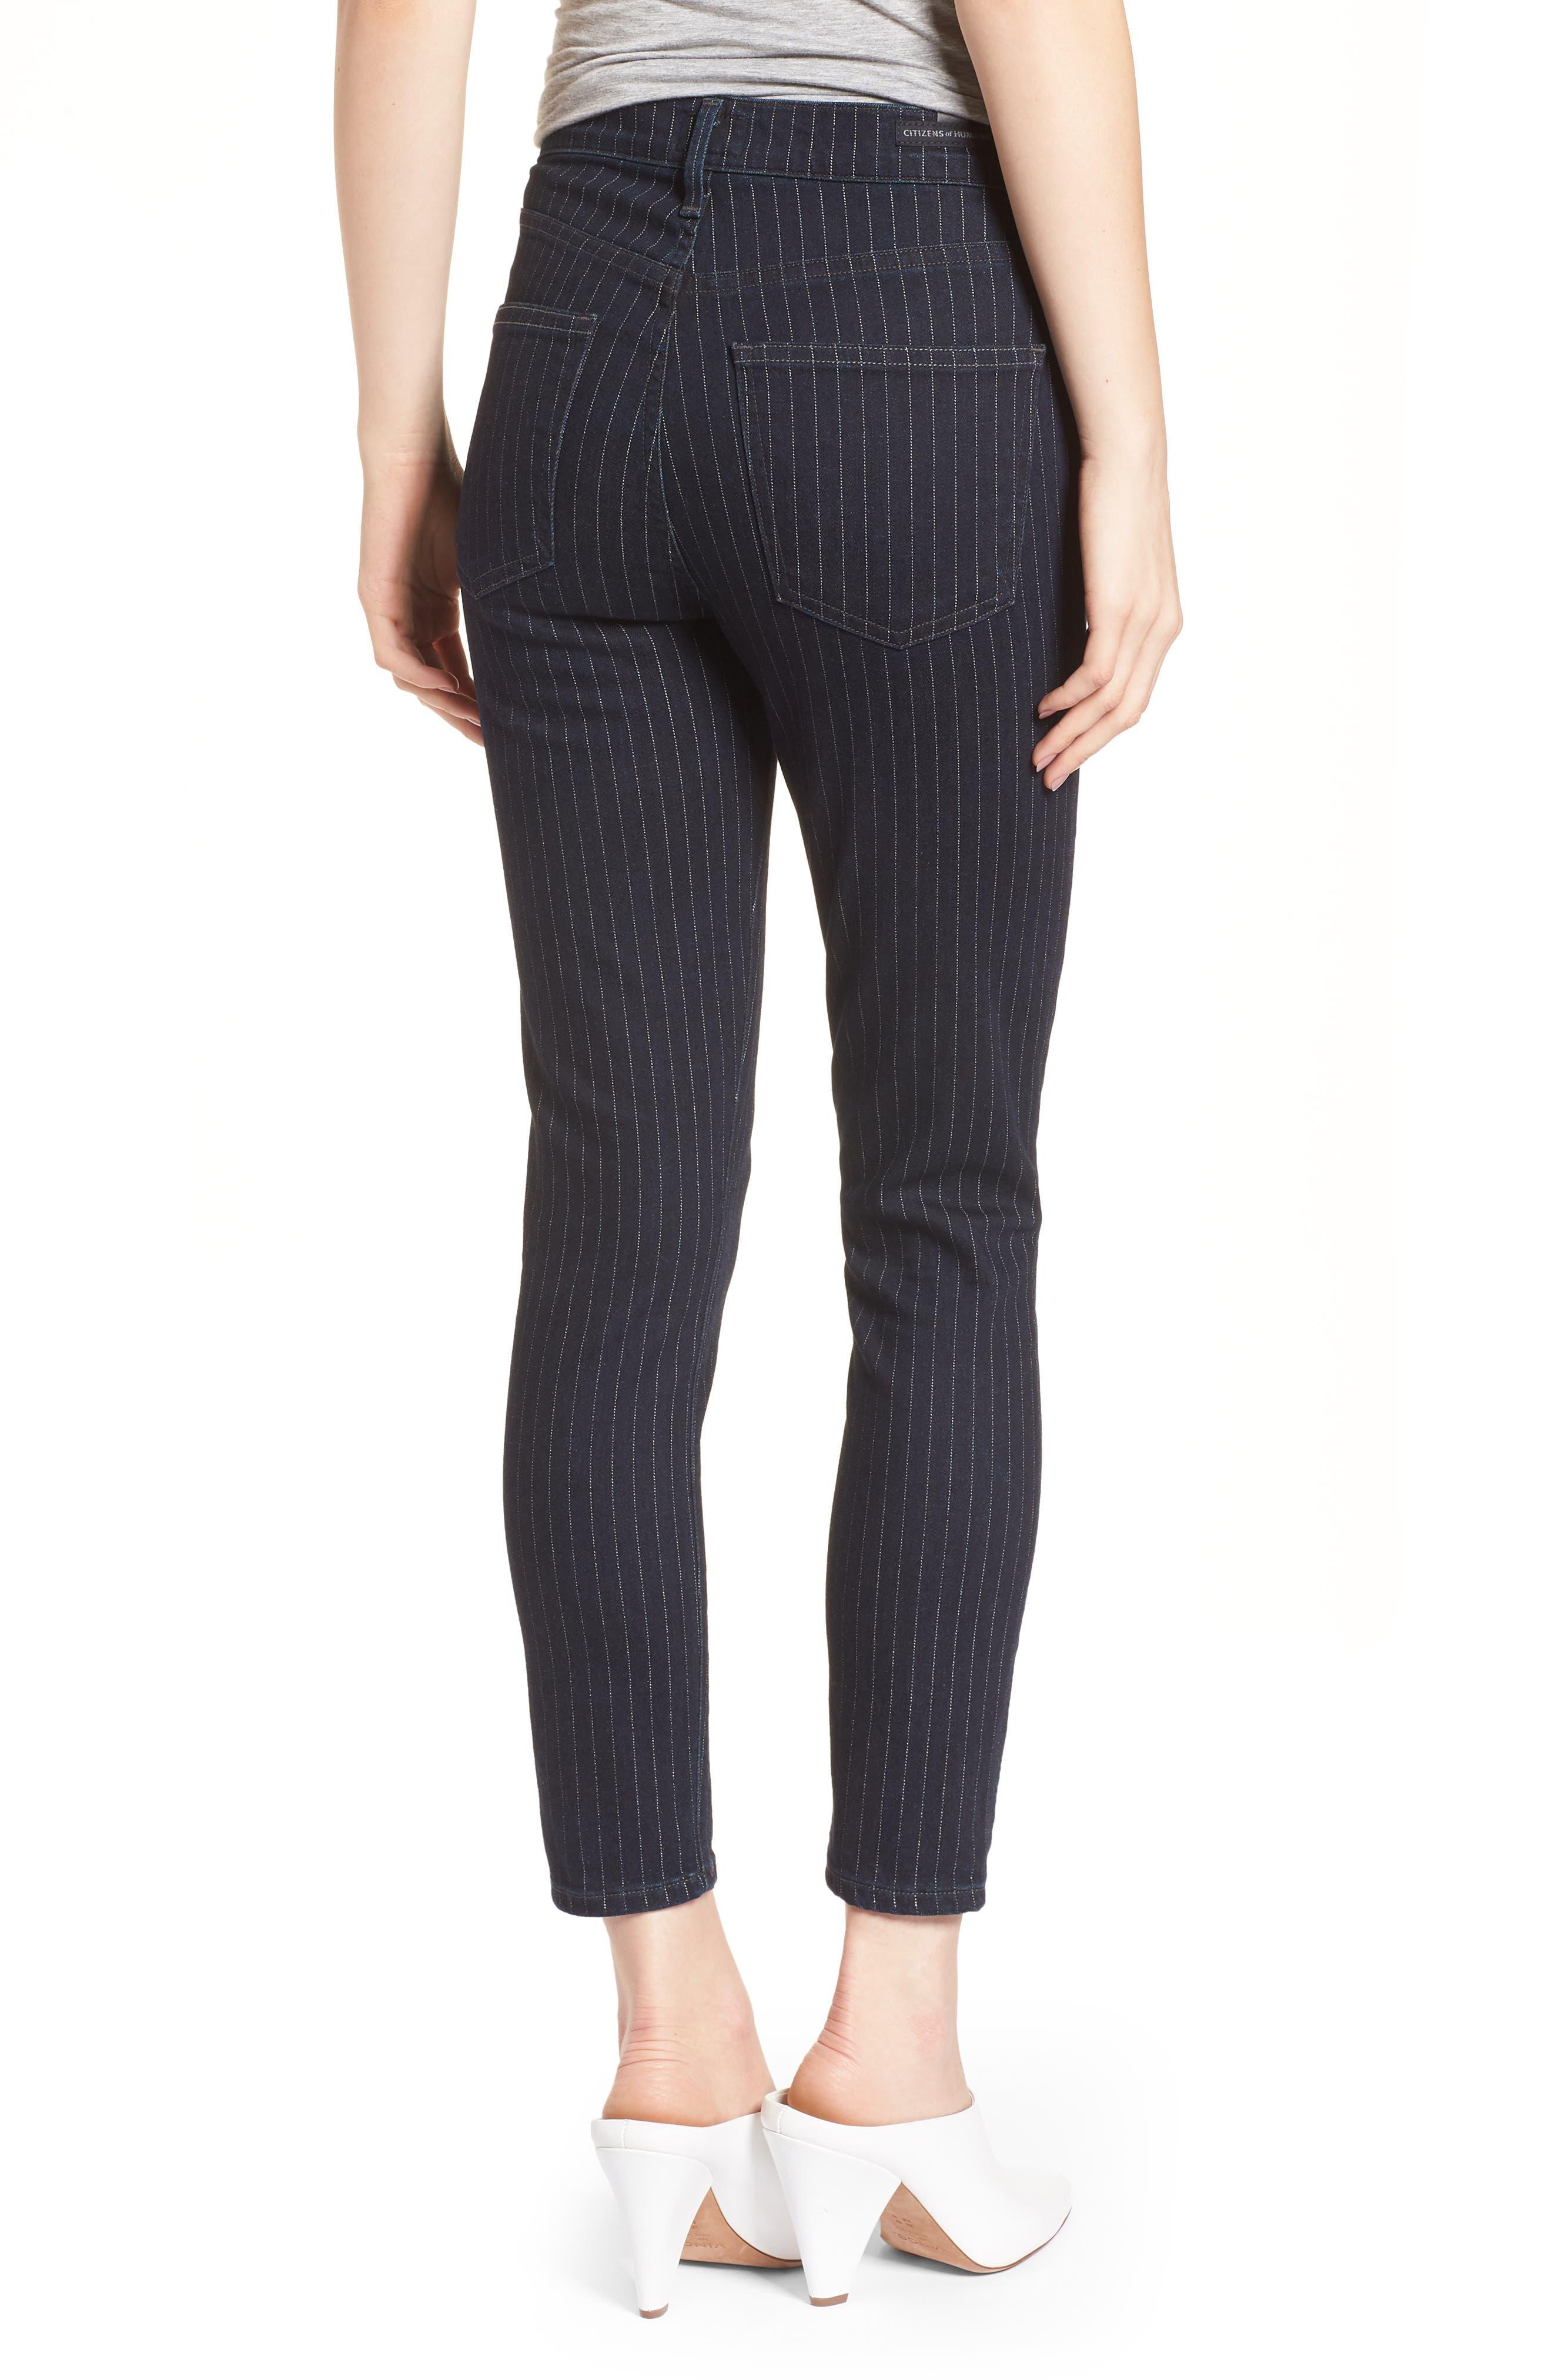 Rocket High Waist Crop Skinny Jeans,                             Alternate thumbnail 2, color,                             Pinstripe